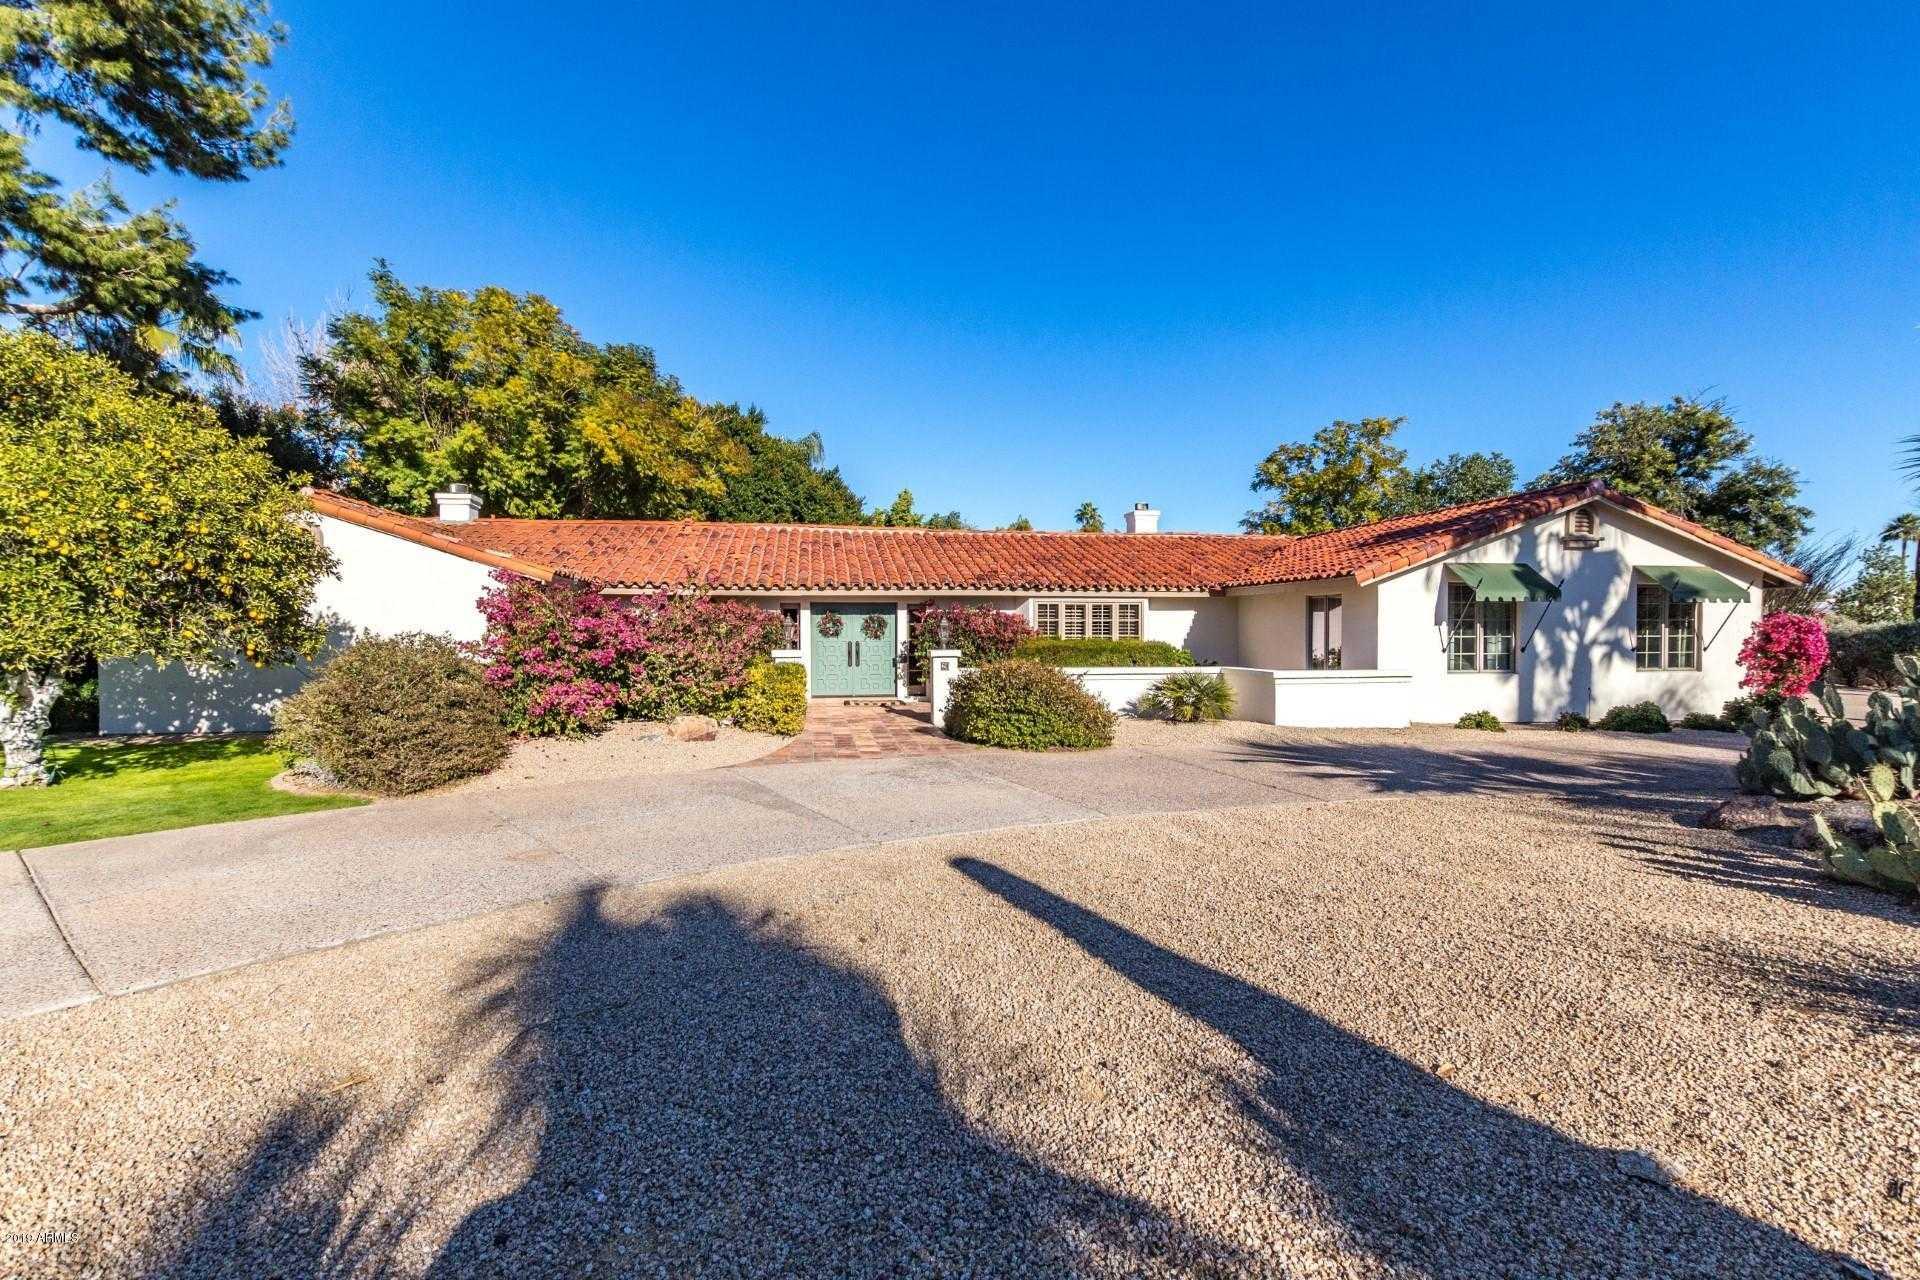 $1,750,000 - 3Br/3Ba - Home for Sale in Casa Blanca Estates Lot 20-37 & Tr A, Paradise Valley